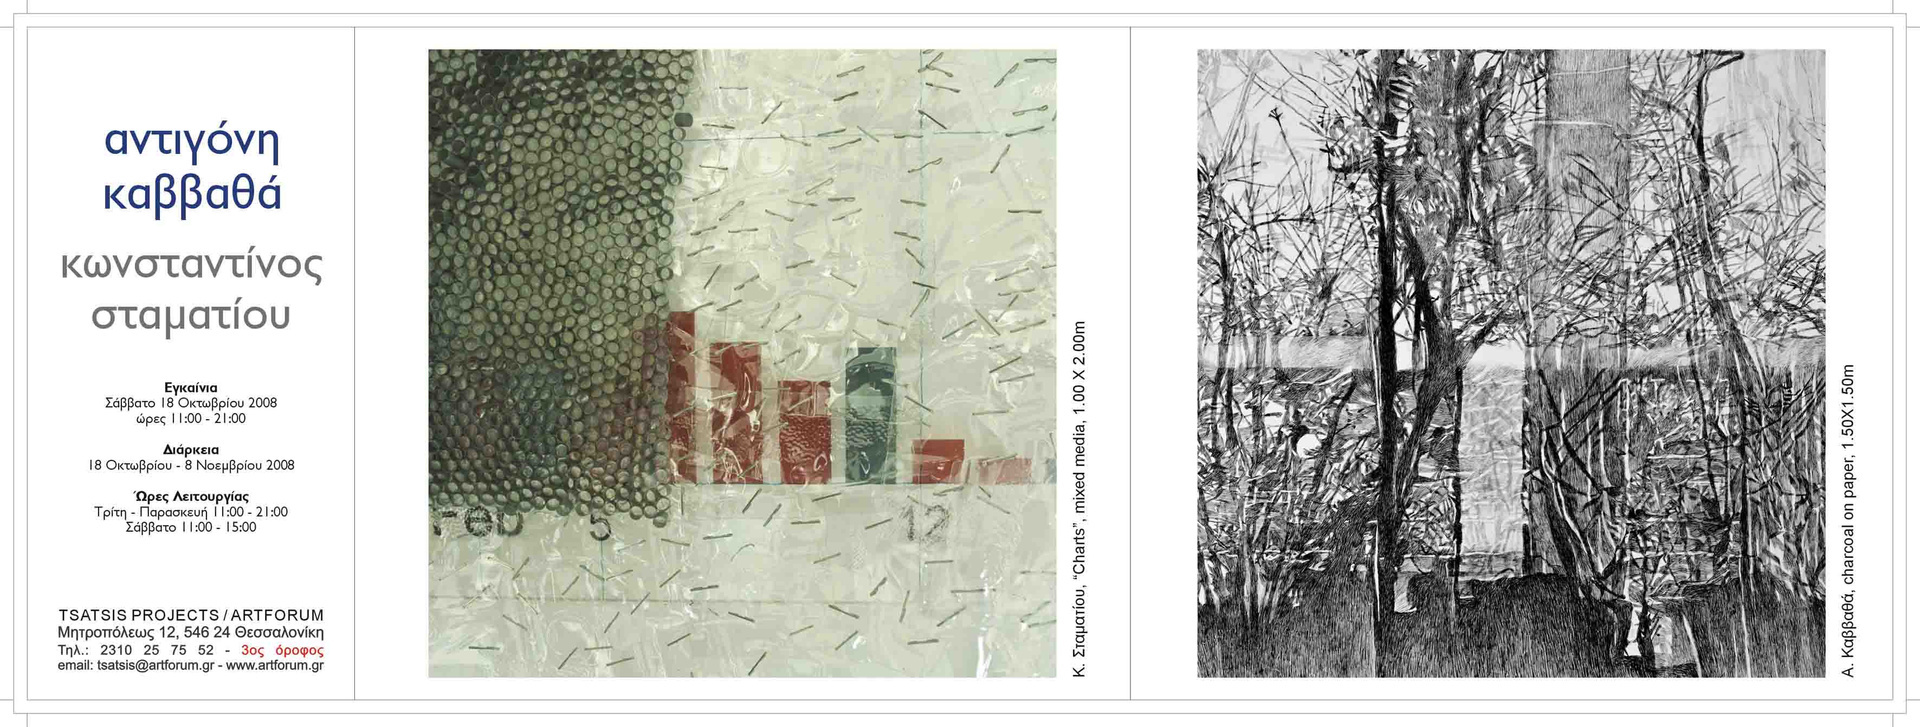 Tsatsis Projects/Artforum, invitation, 2008